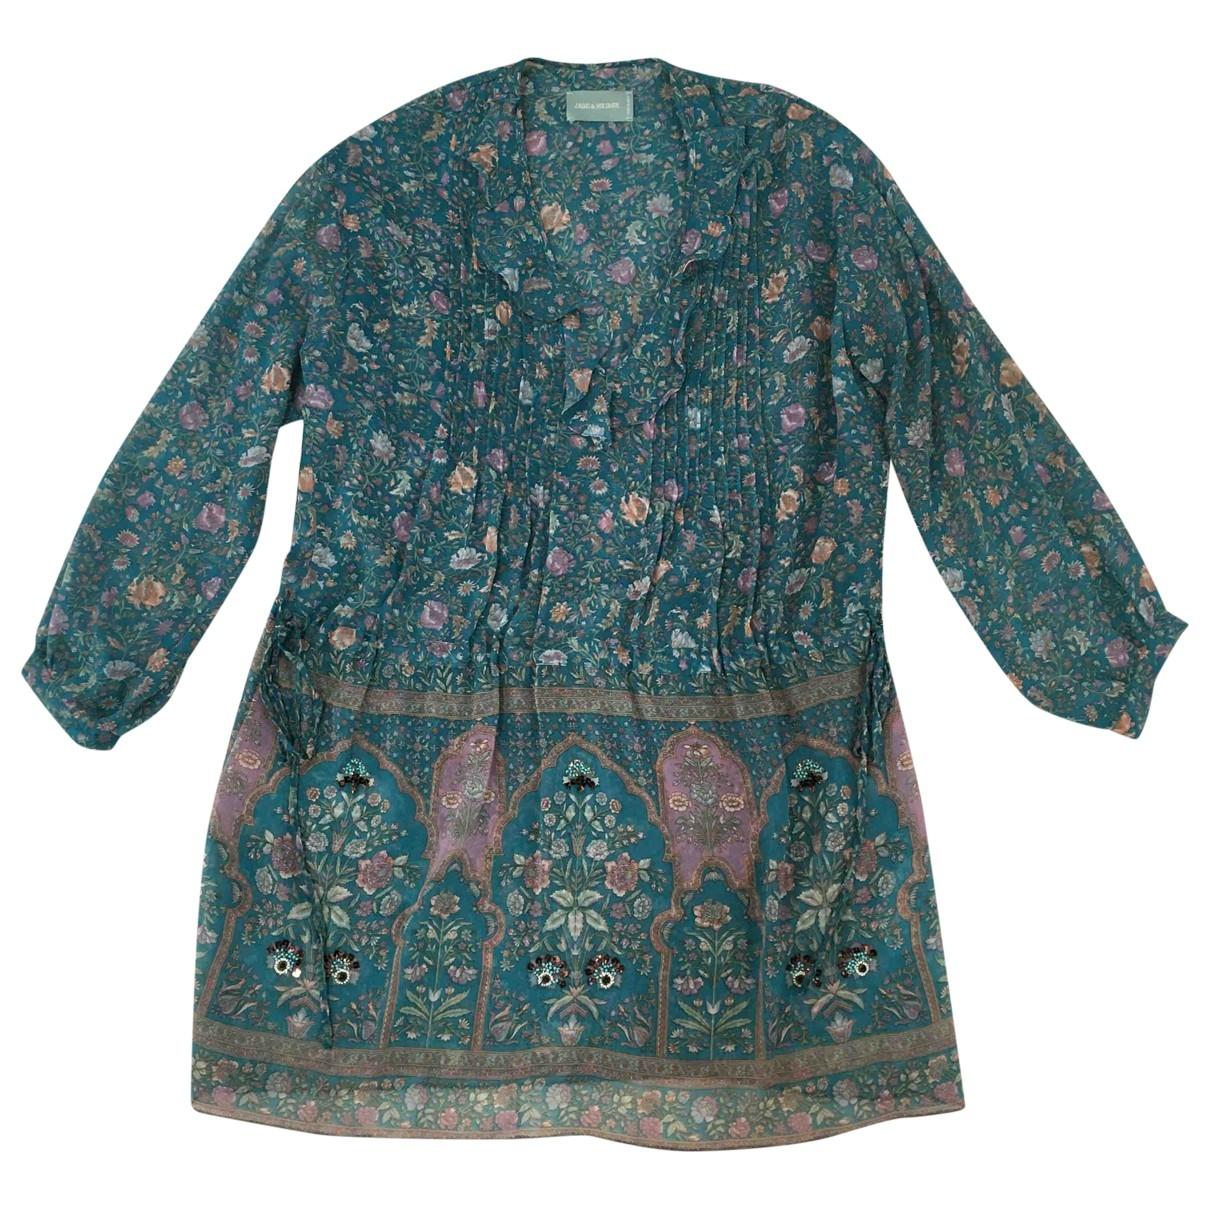 Zadig & Voltaire \N Multicolour dress for Women S International